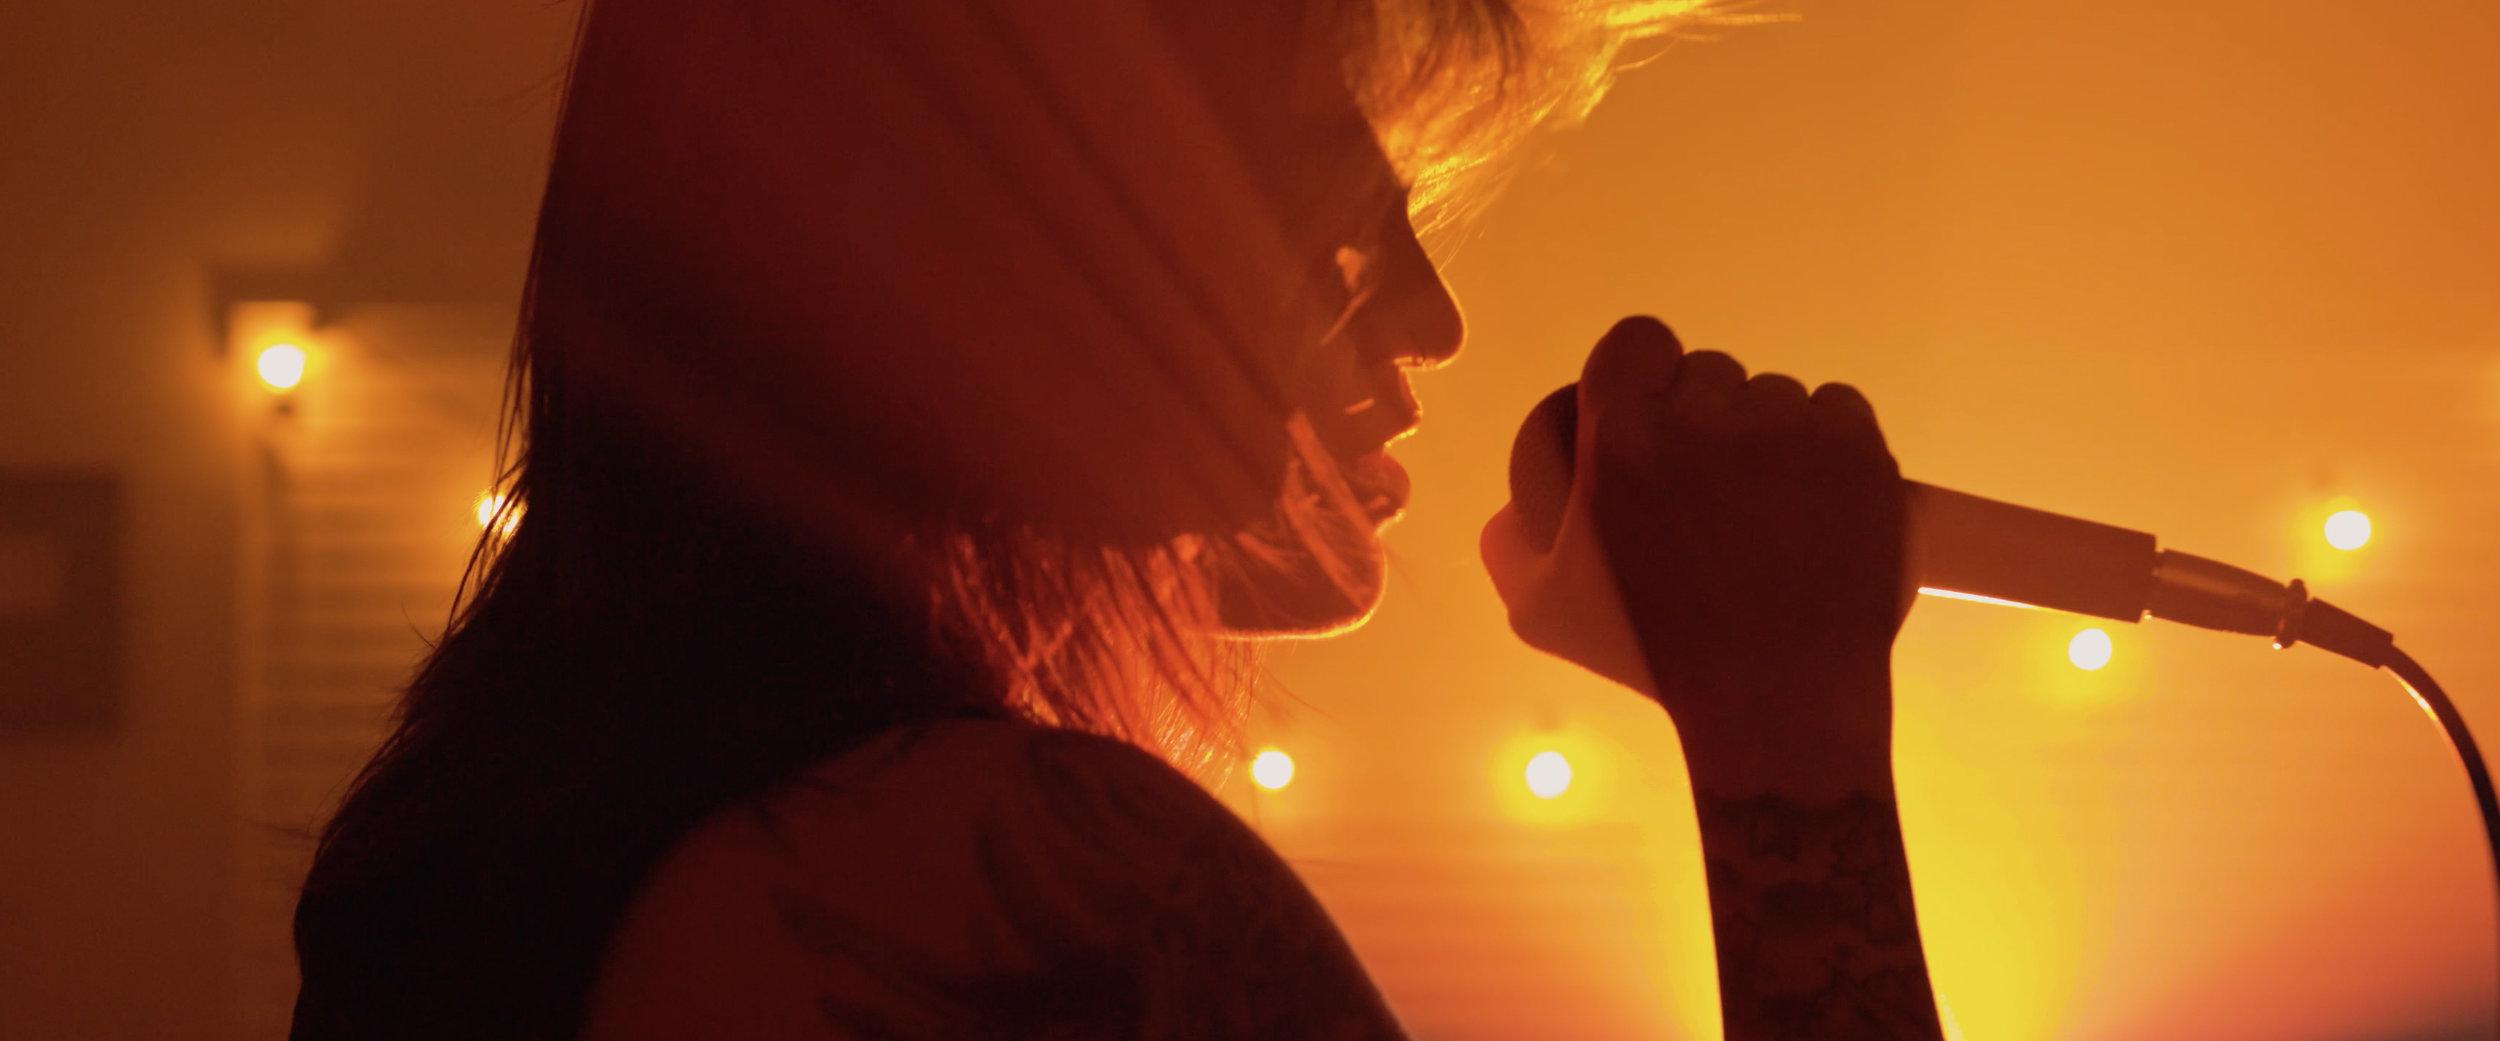 Watch The Film[lightbox] -